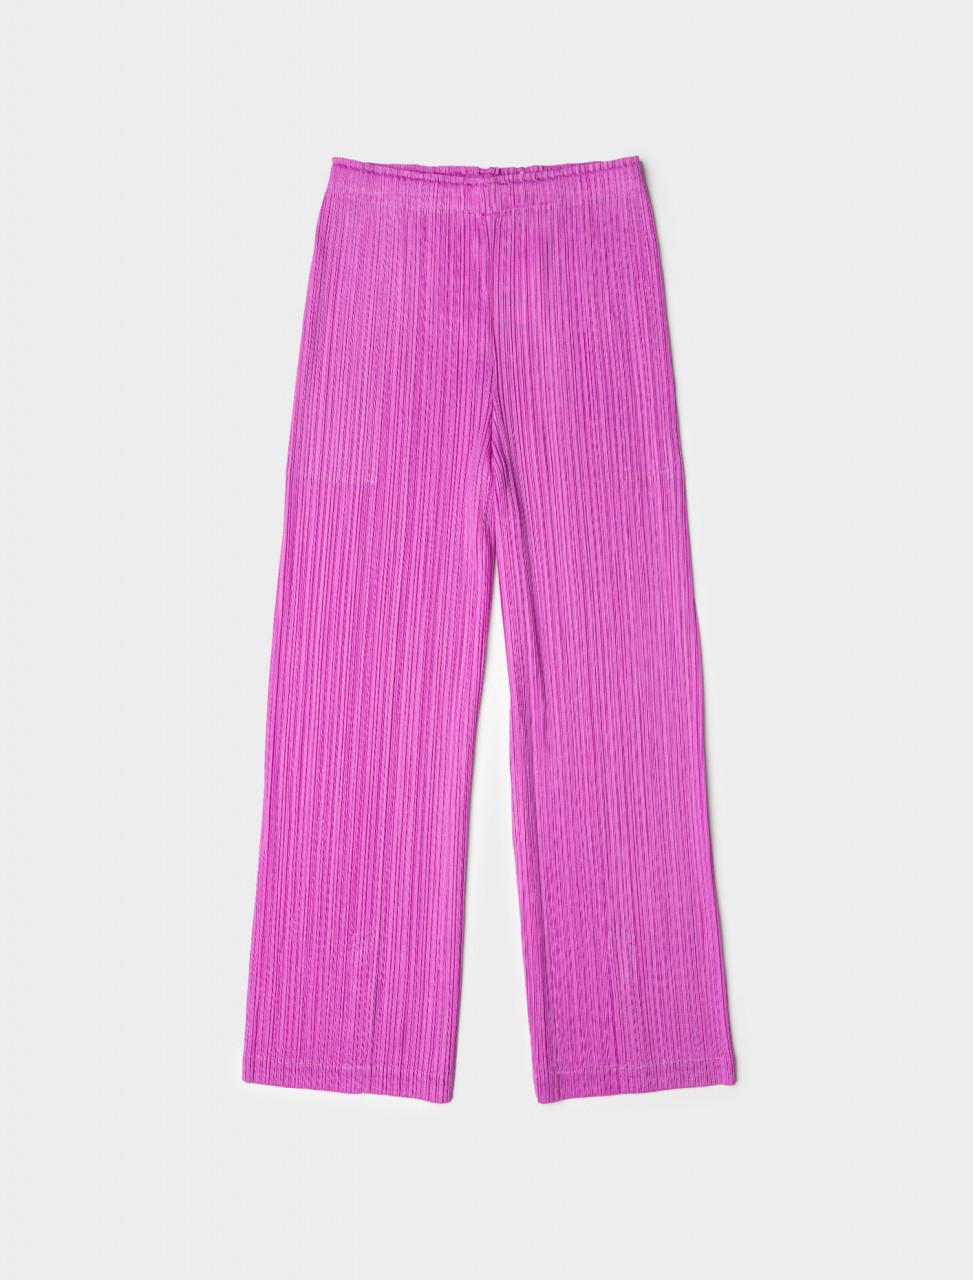 Pleated Trousers in Fuchsia